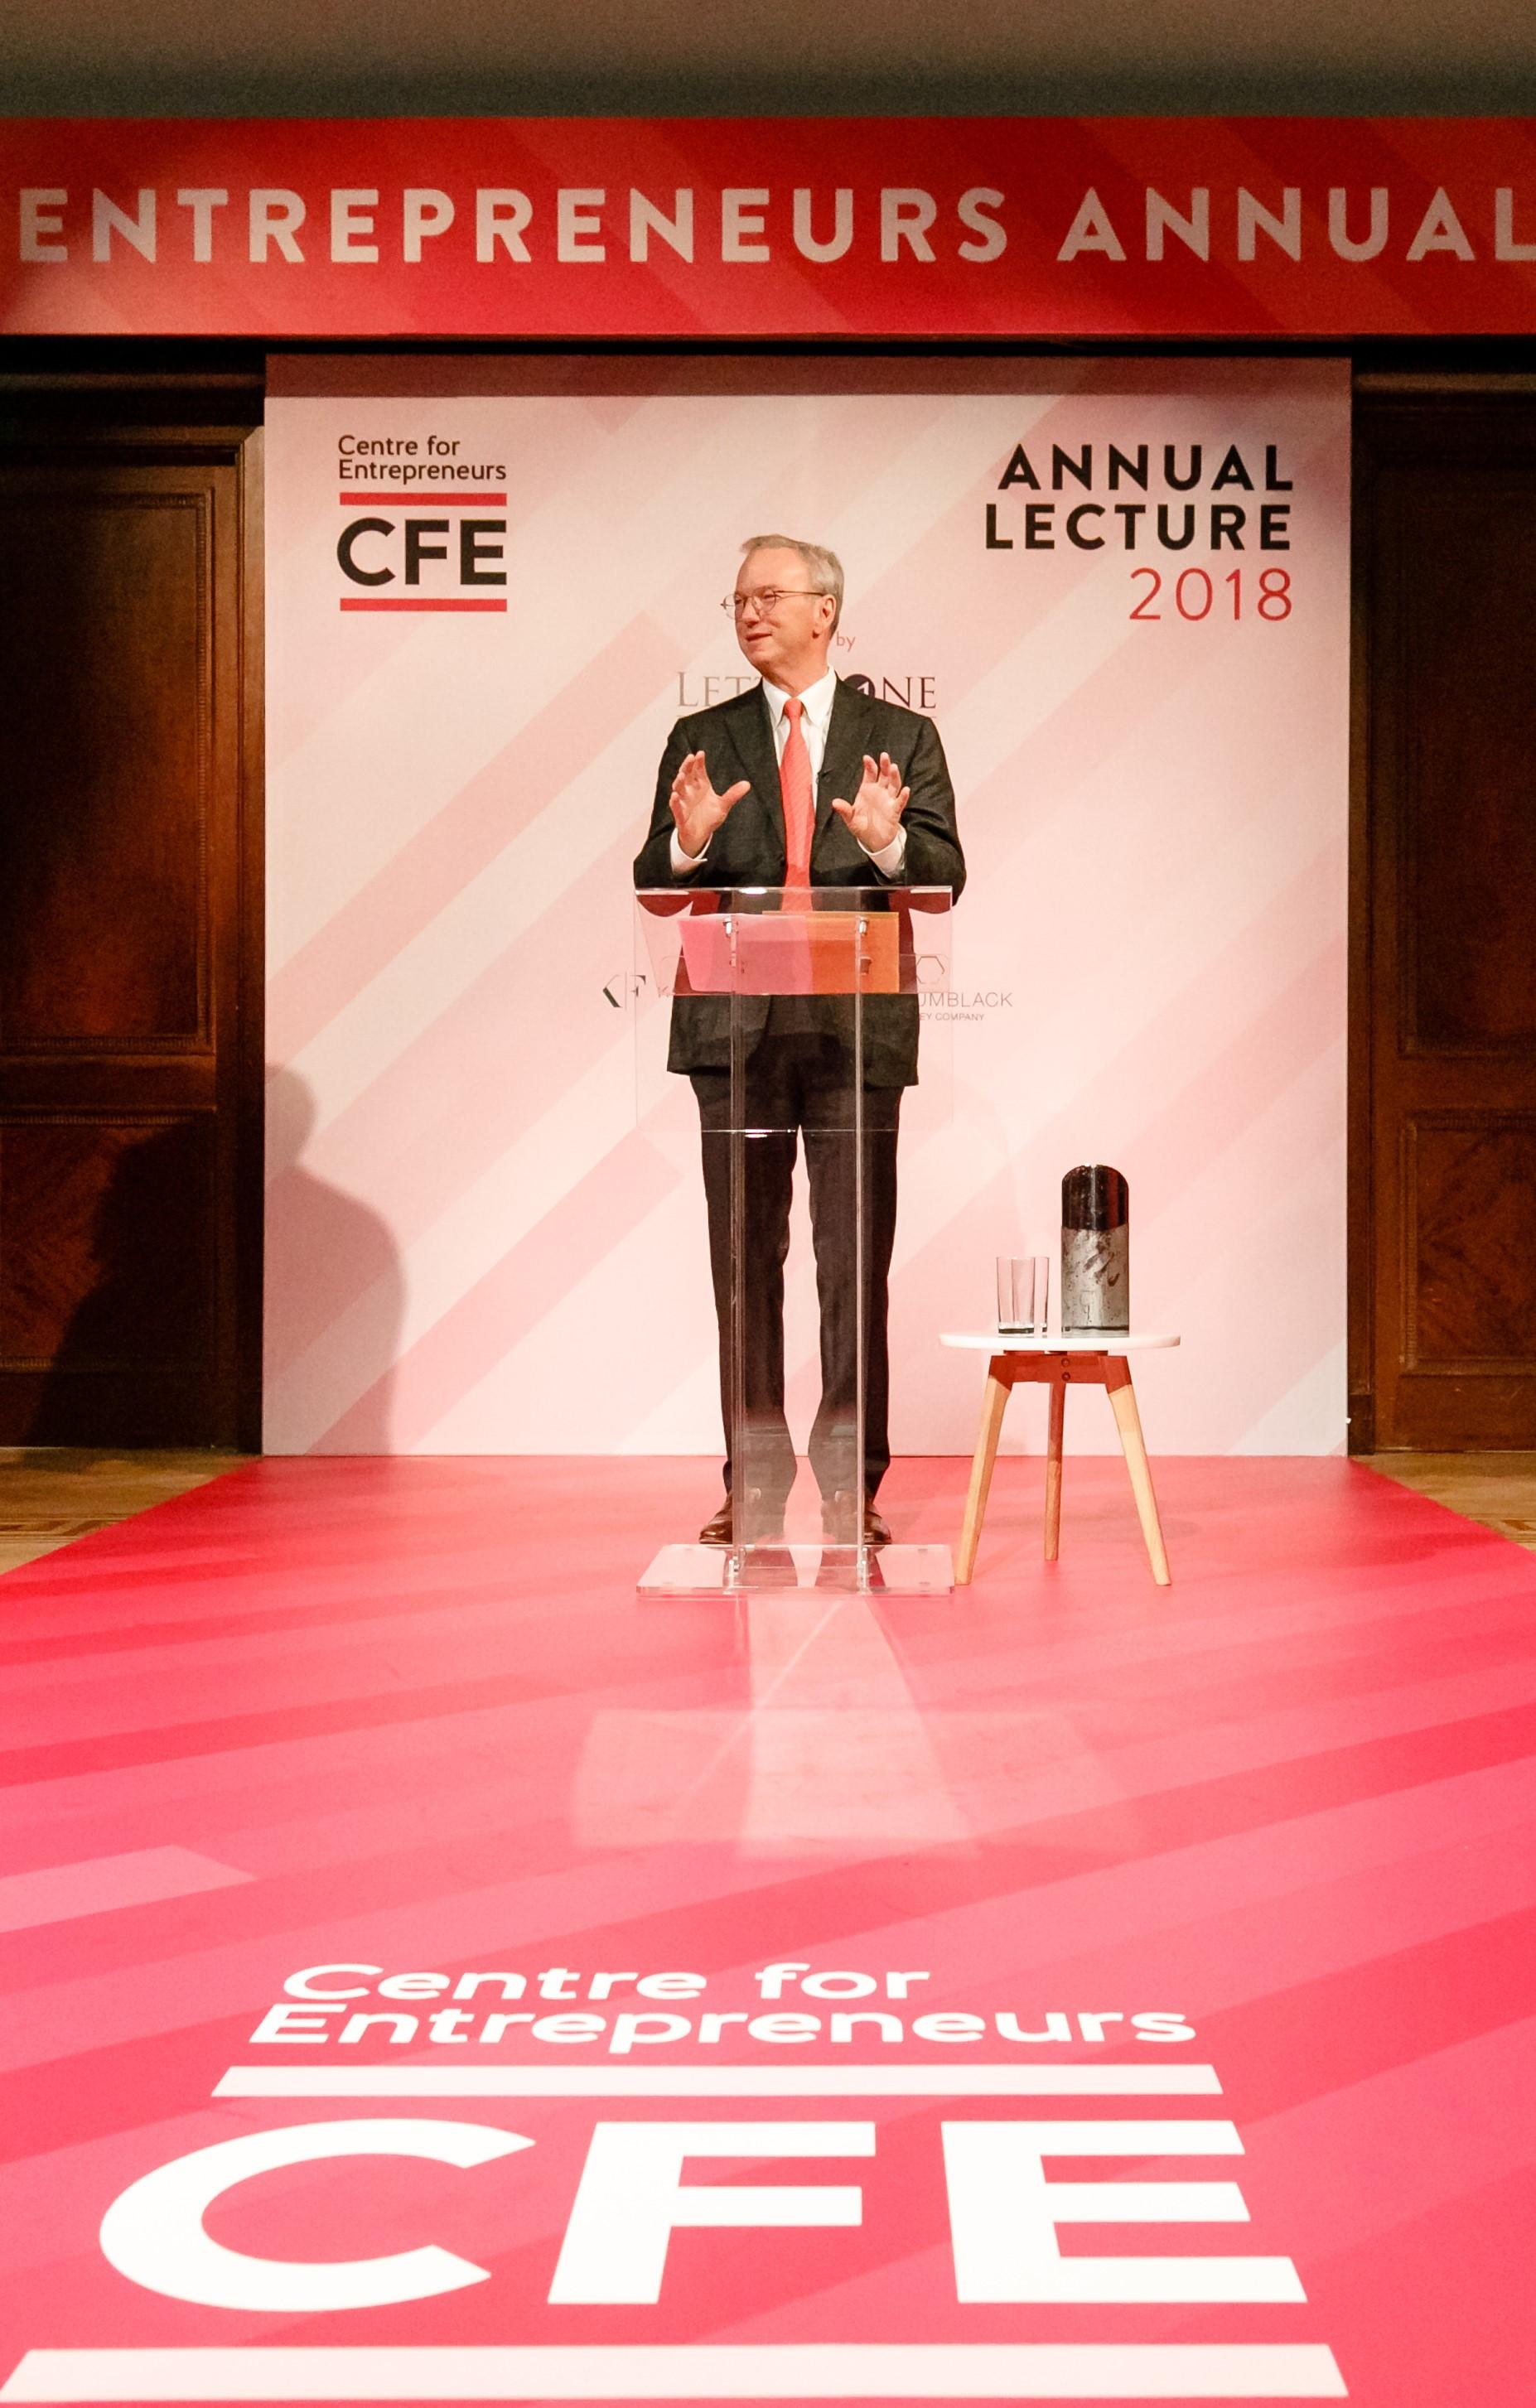 Annual Lecture - Centre for Entrepreneurs